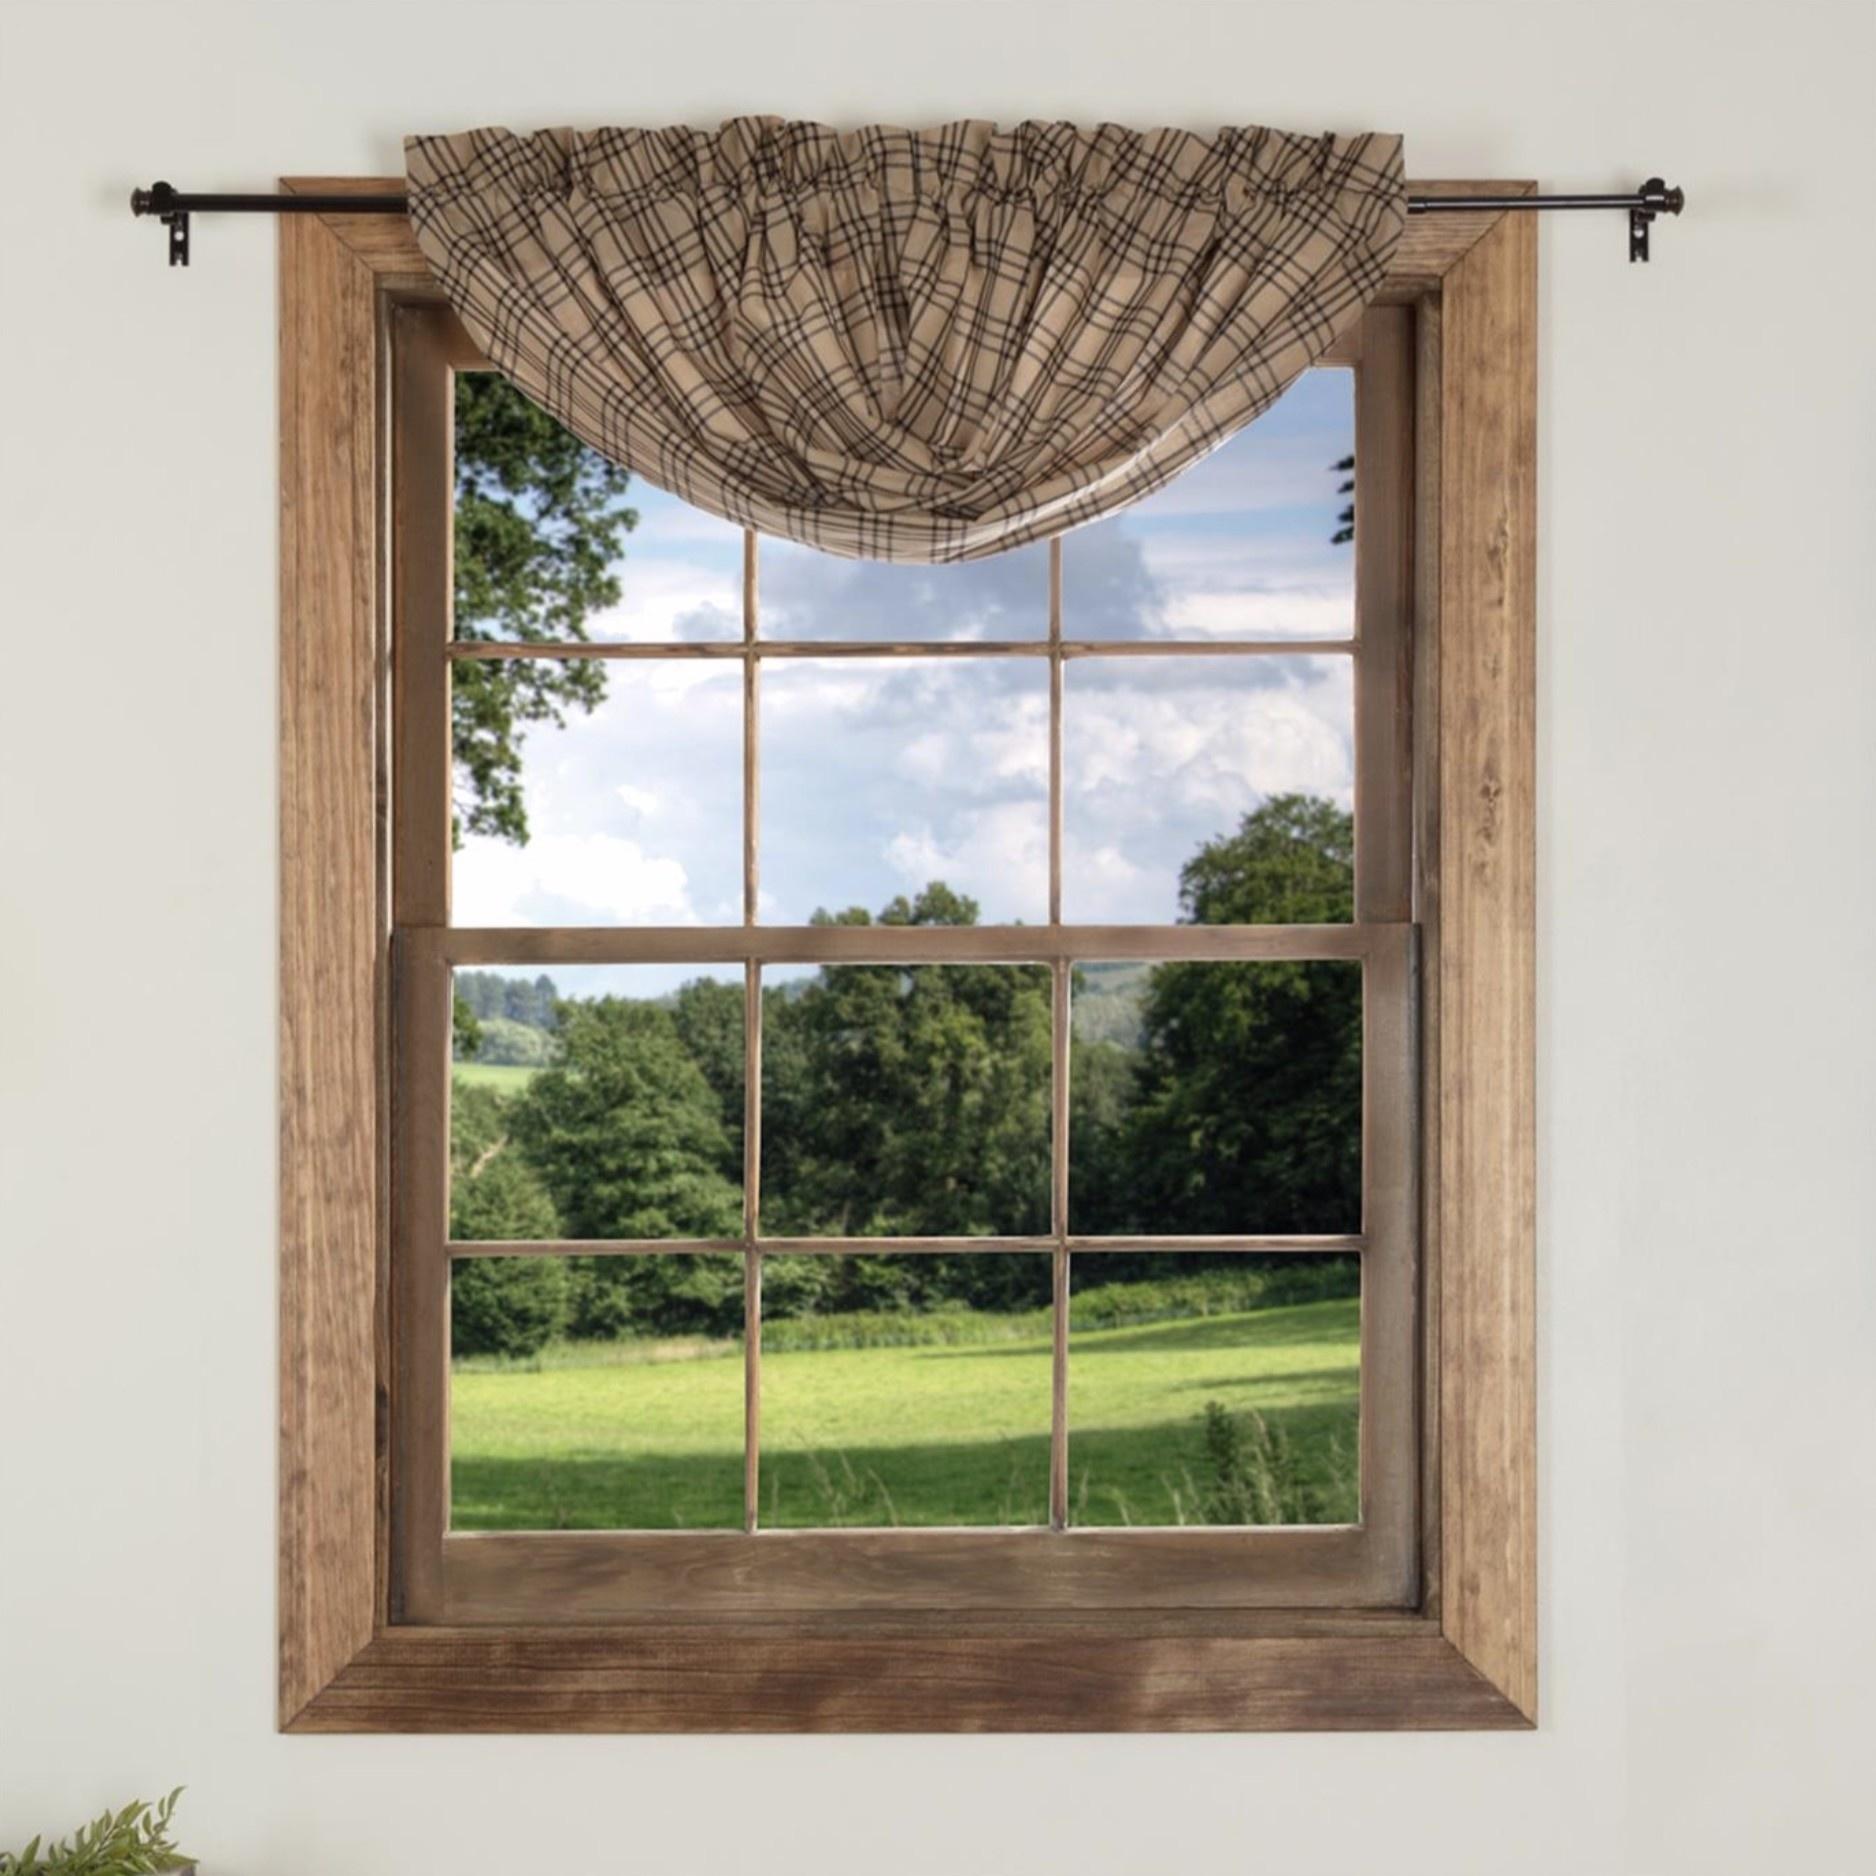 Curtains Drapes Farmhouse Country Primitive Sawyer Mill Plaid French Door Panel Curtain Home Furniture Diy Cruzeirista Com Br